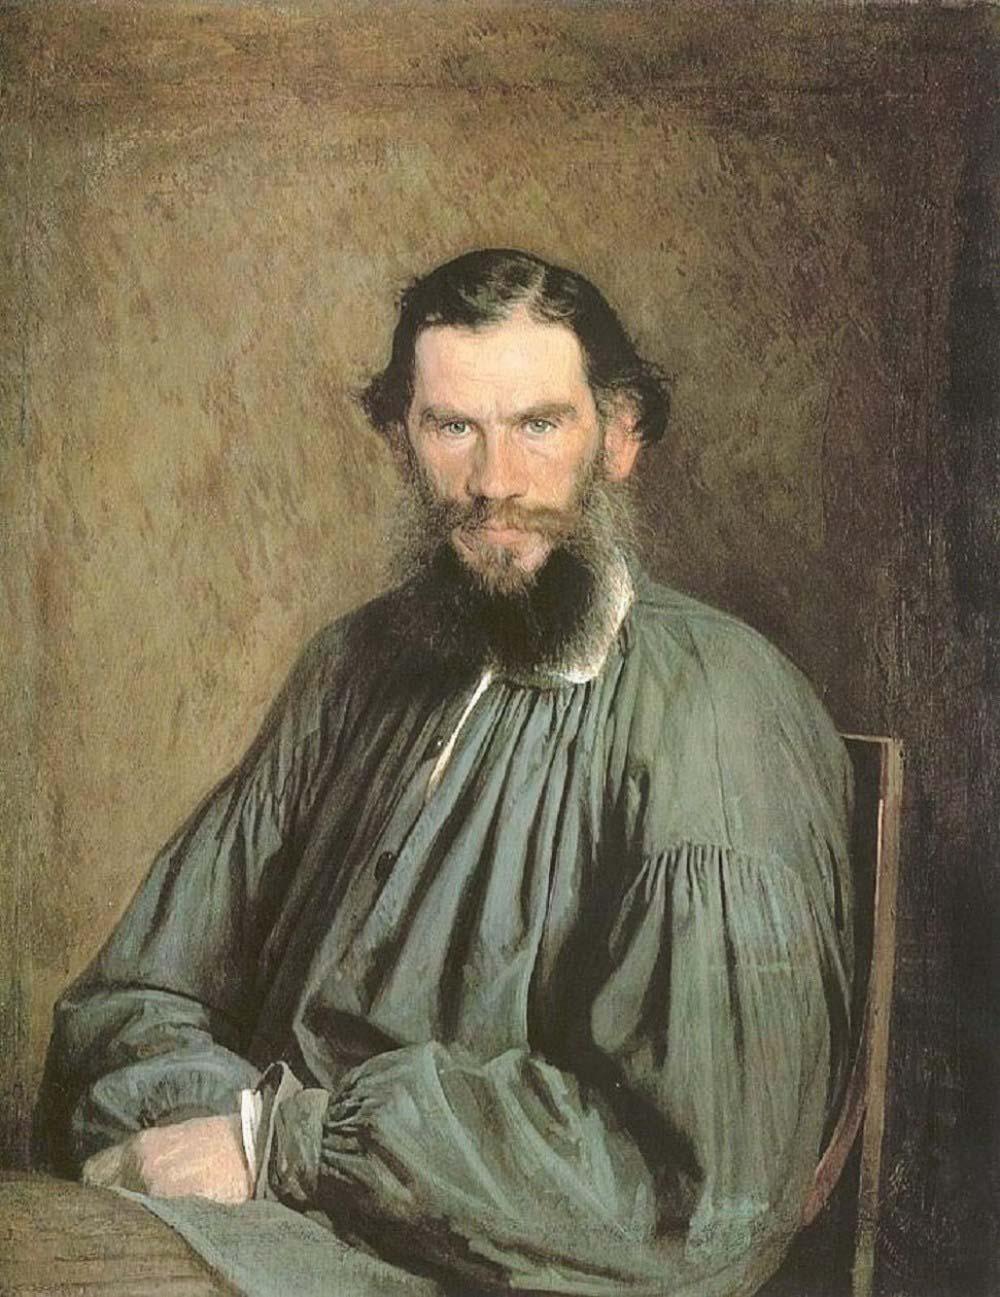 Tolstoy-genclik